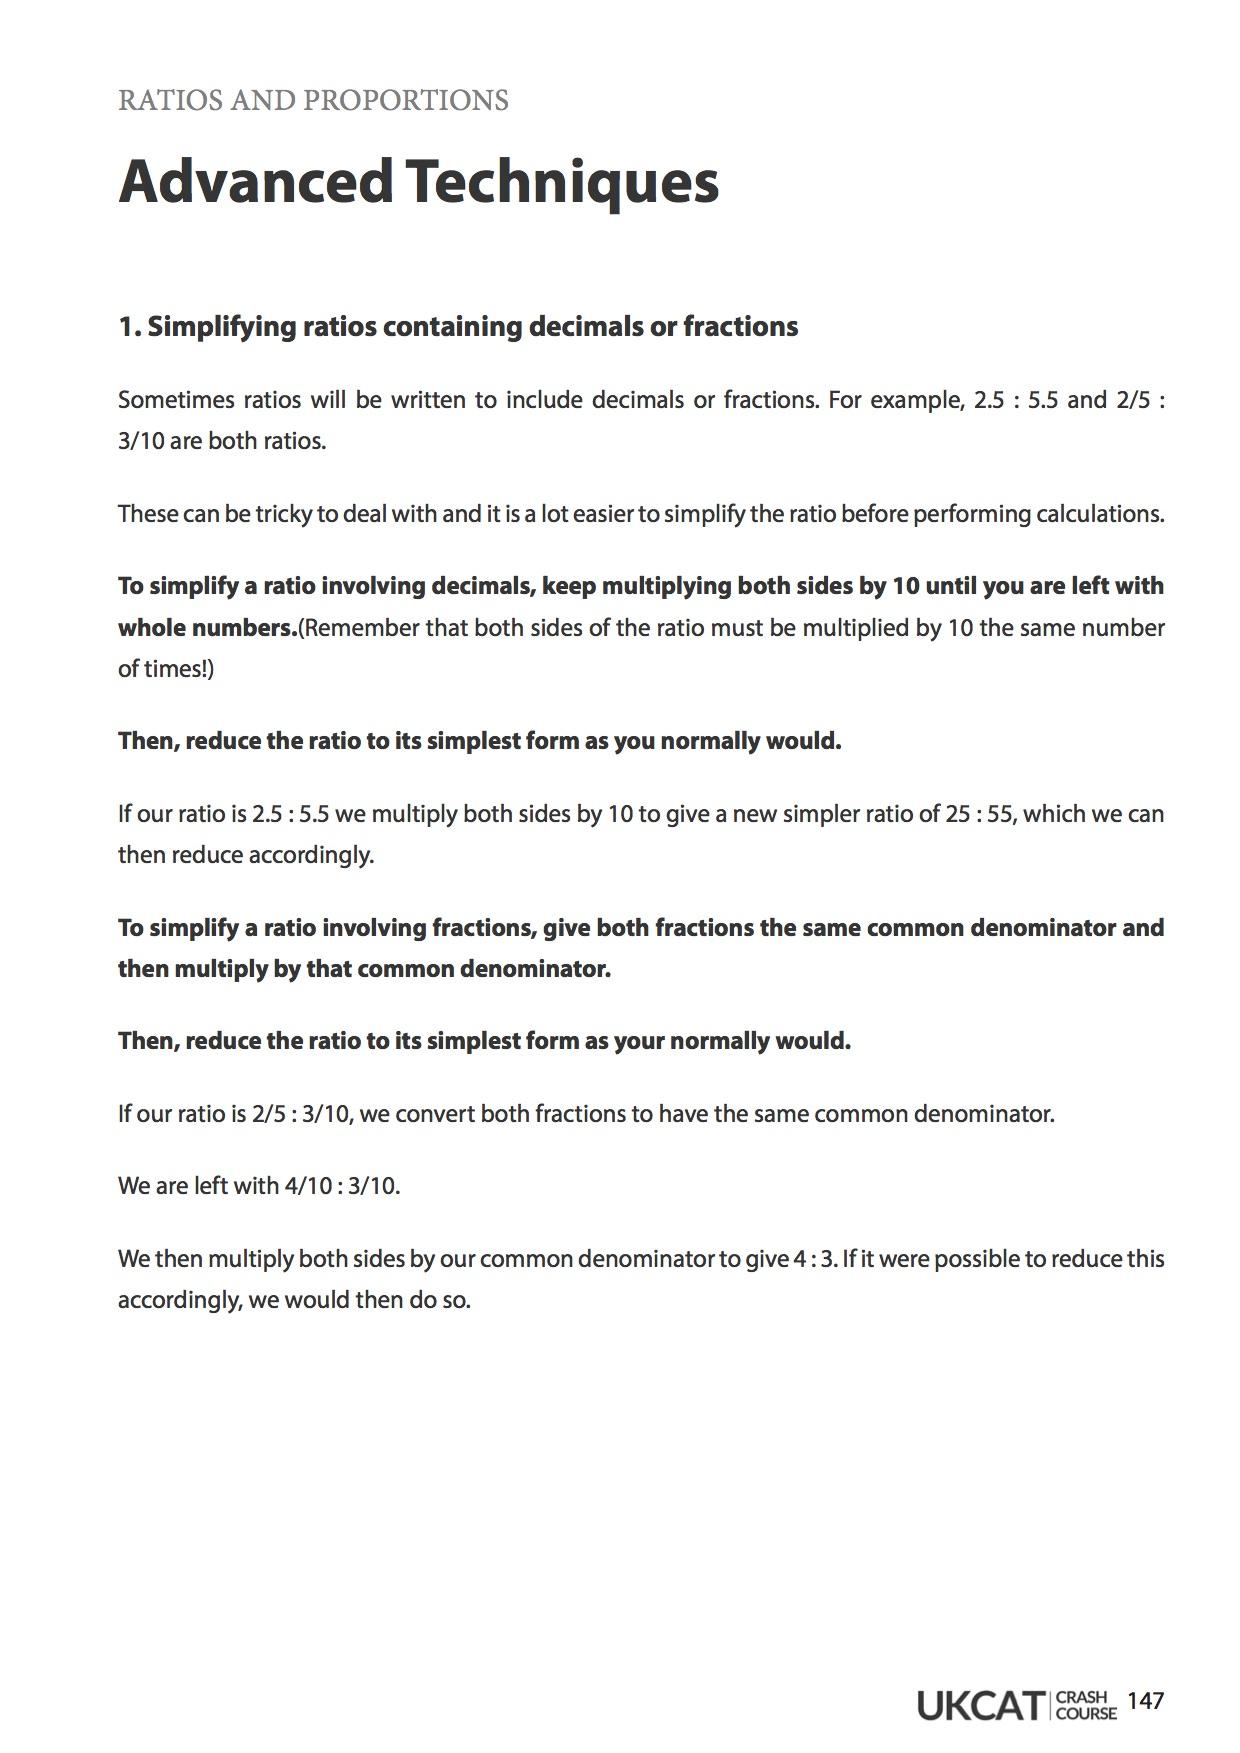 UKCAT Crash Course - Notes, Materials, Workbook | 6med